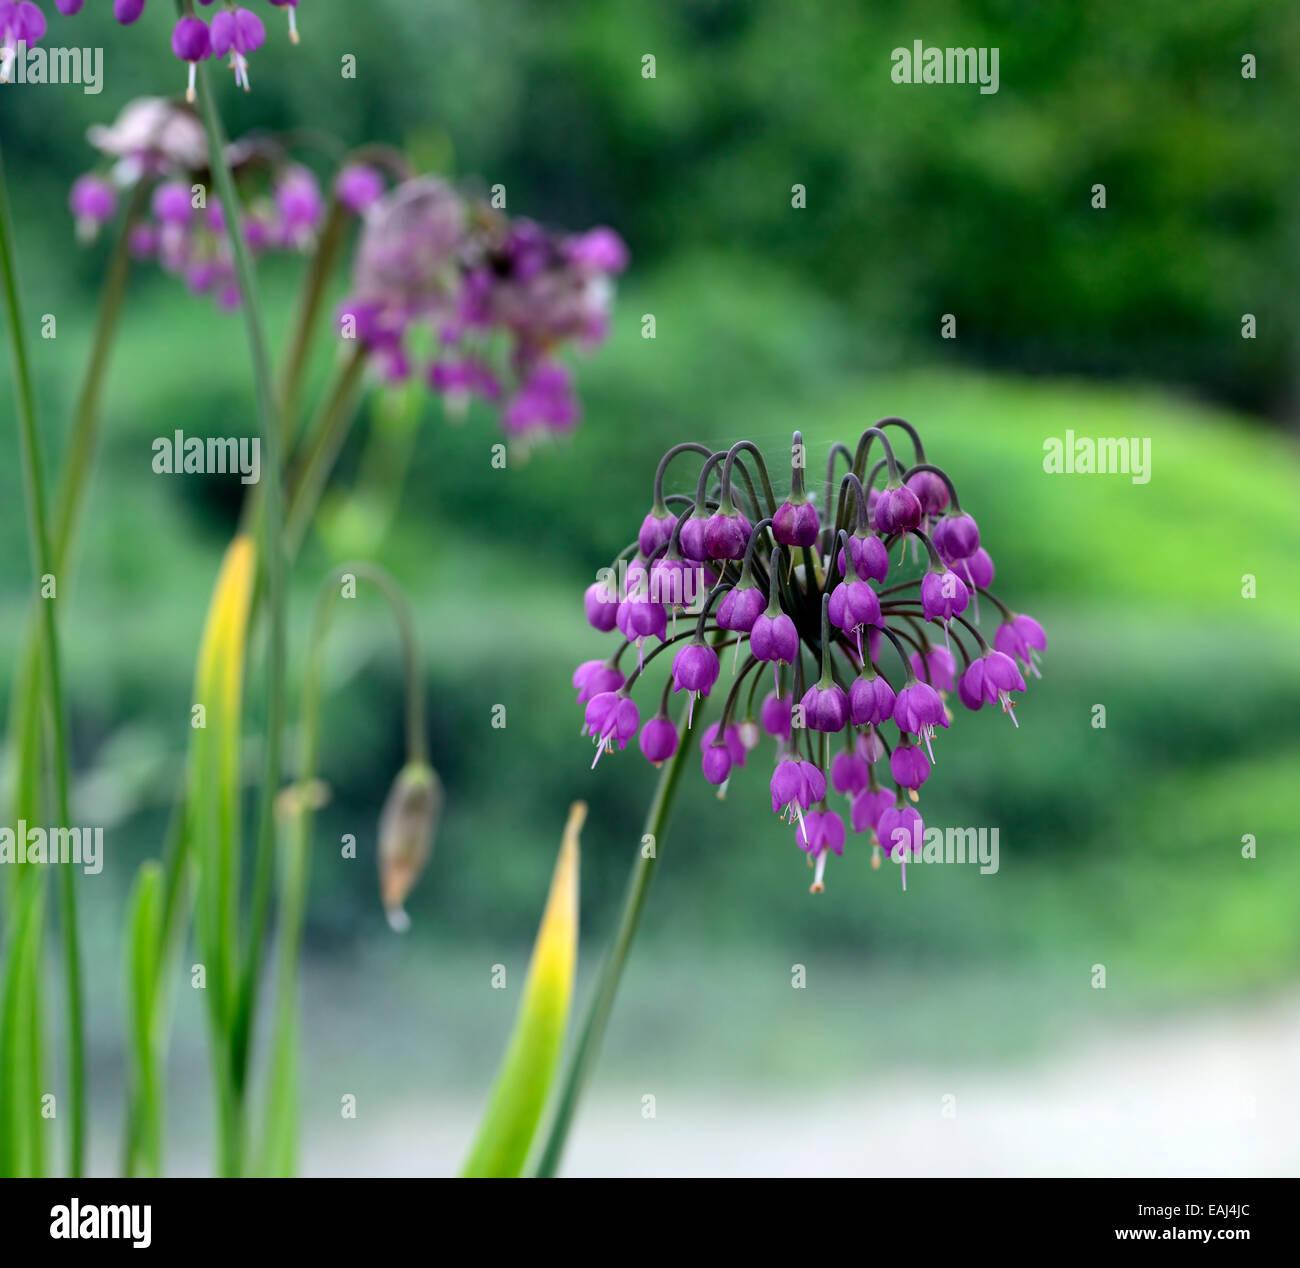 allium cernuum purple flower flowers flowering nodding ...